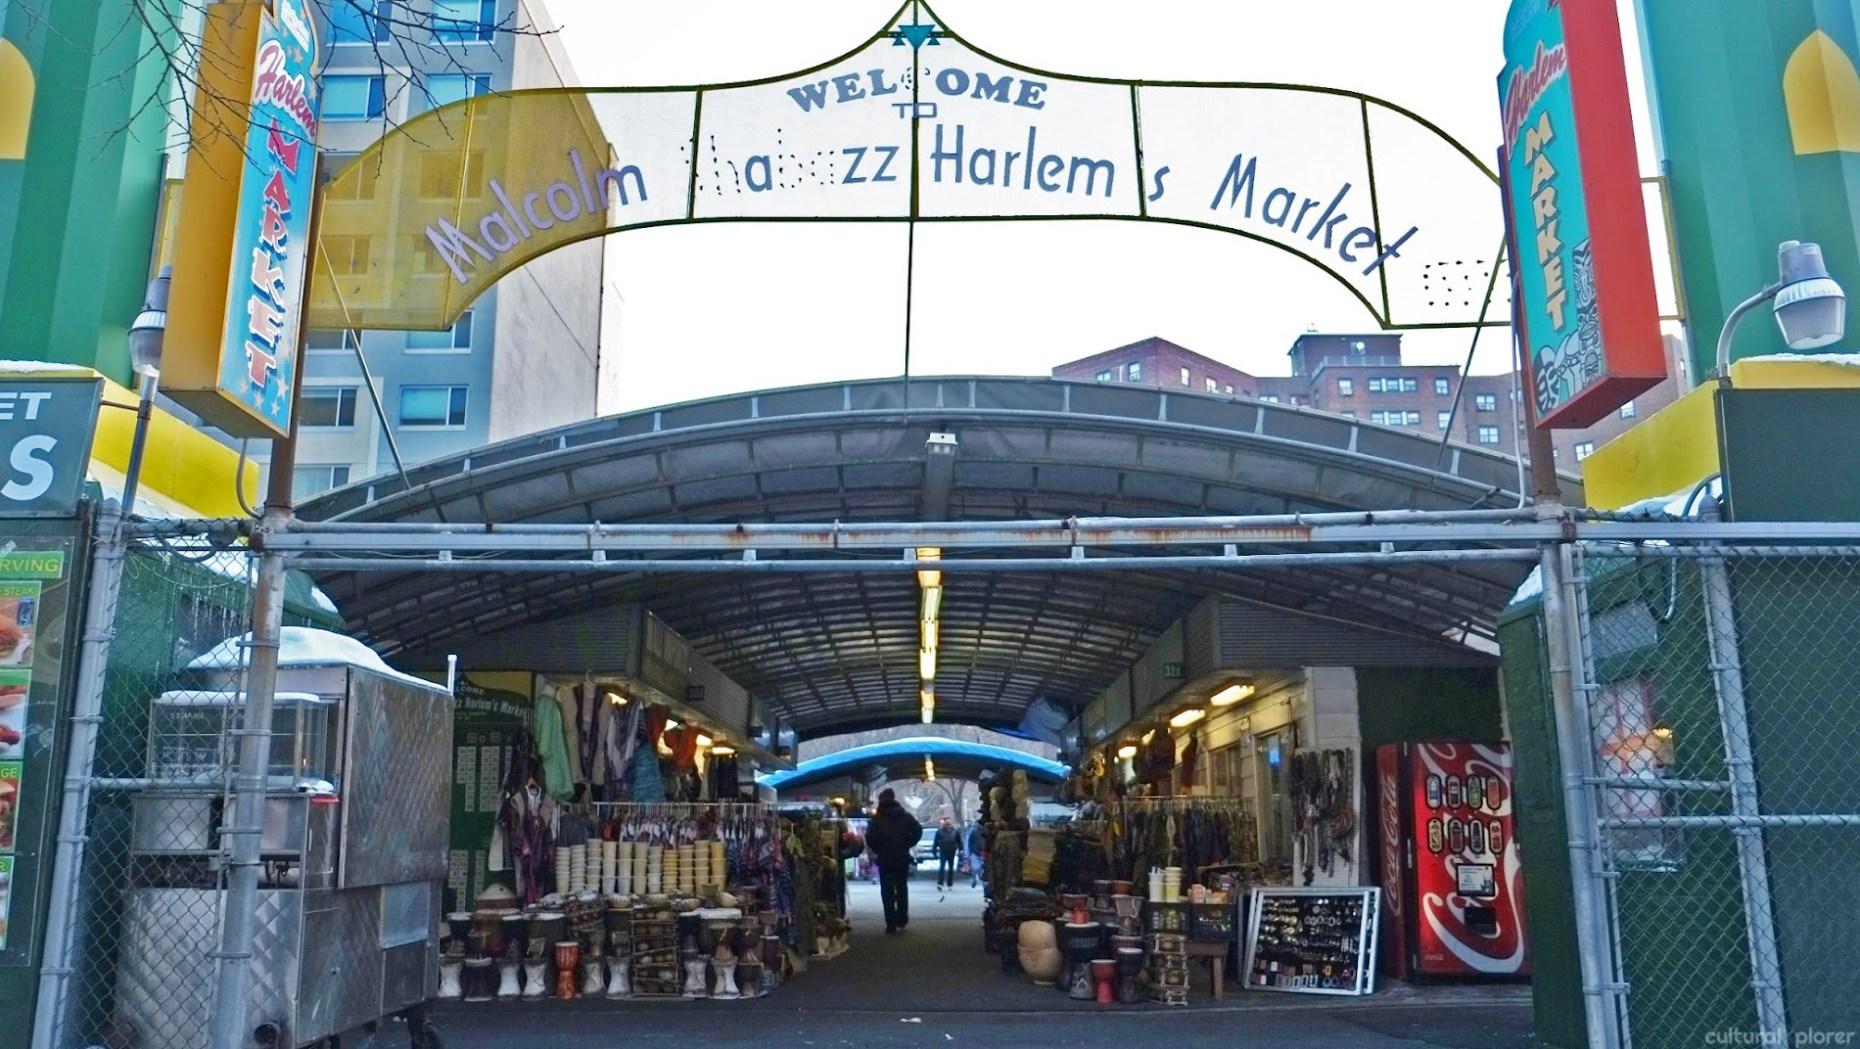 Malcolm Shabazz Harlem Market